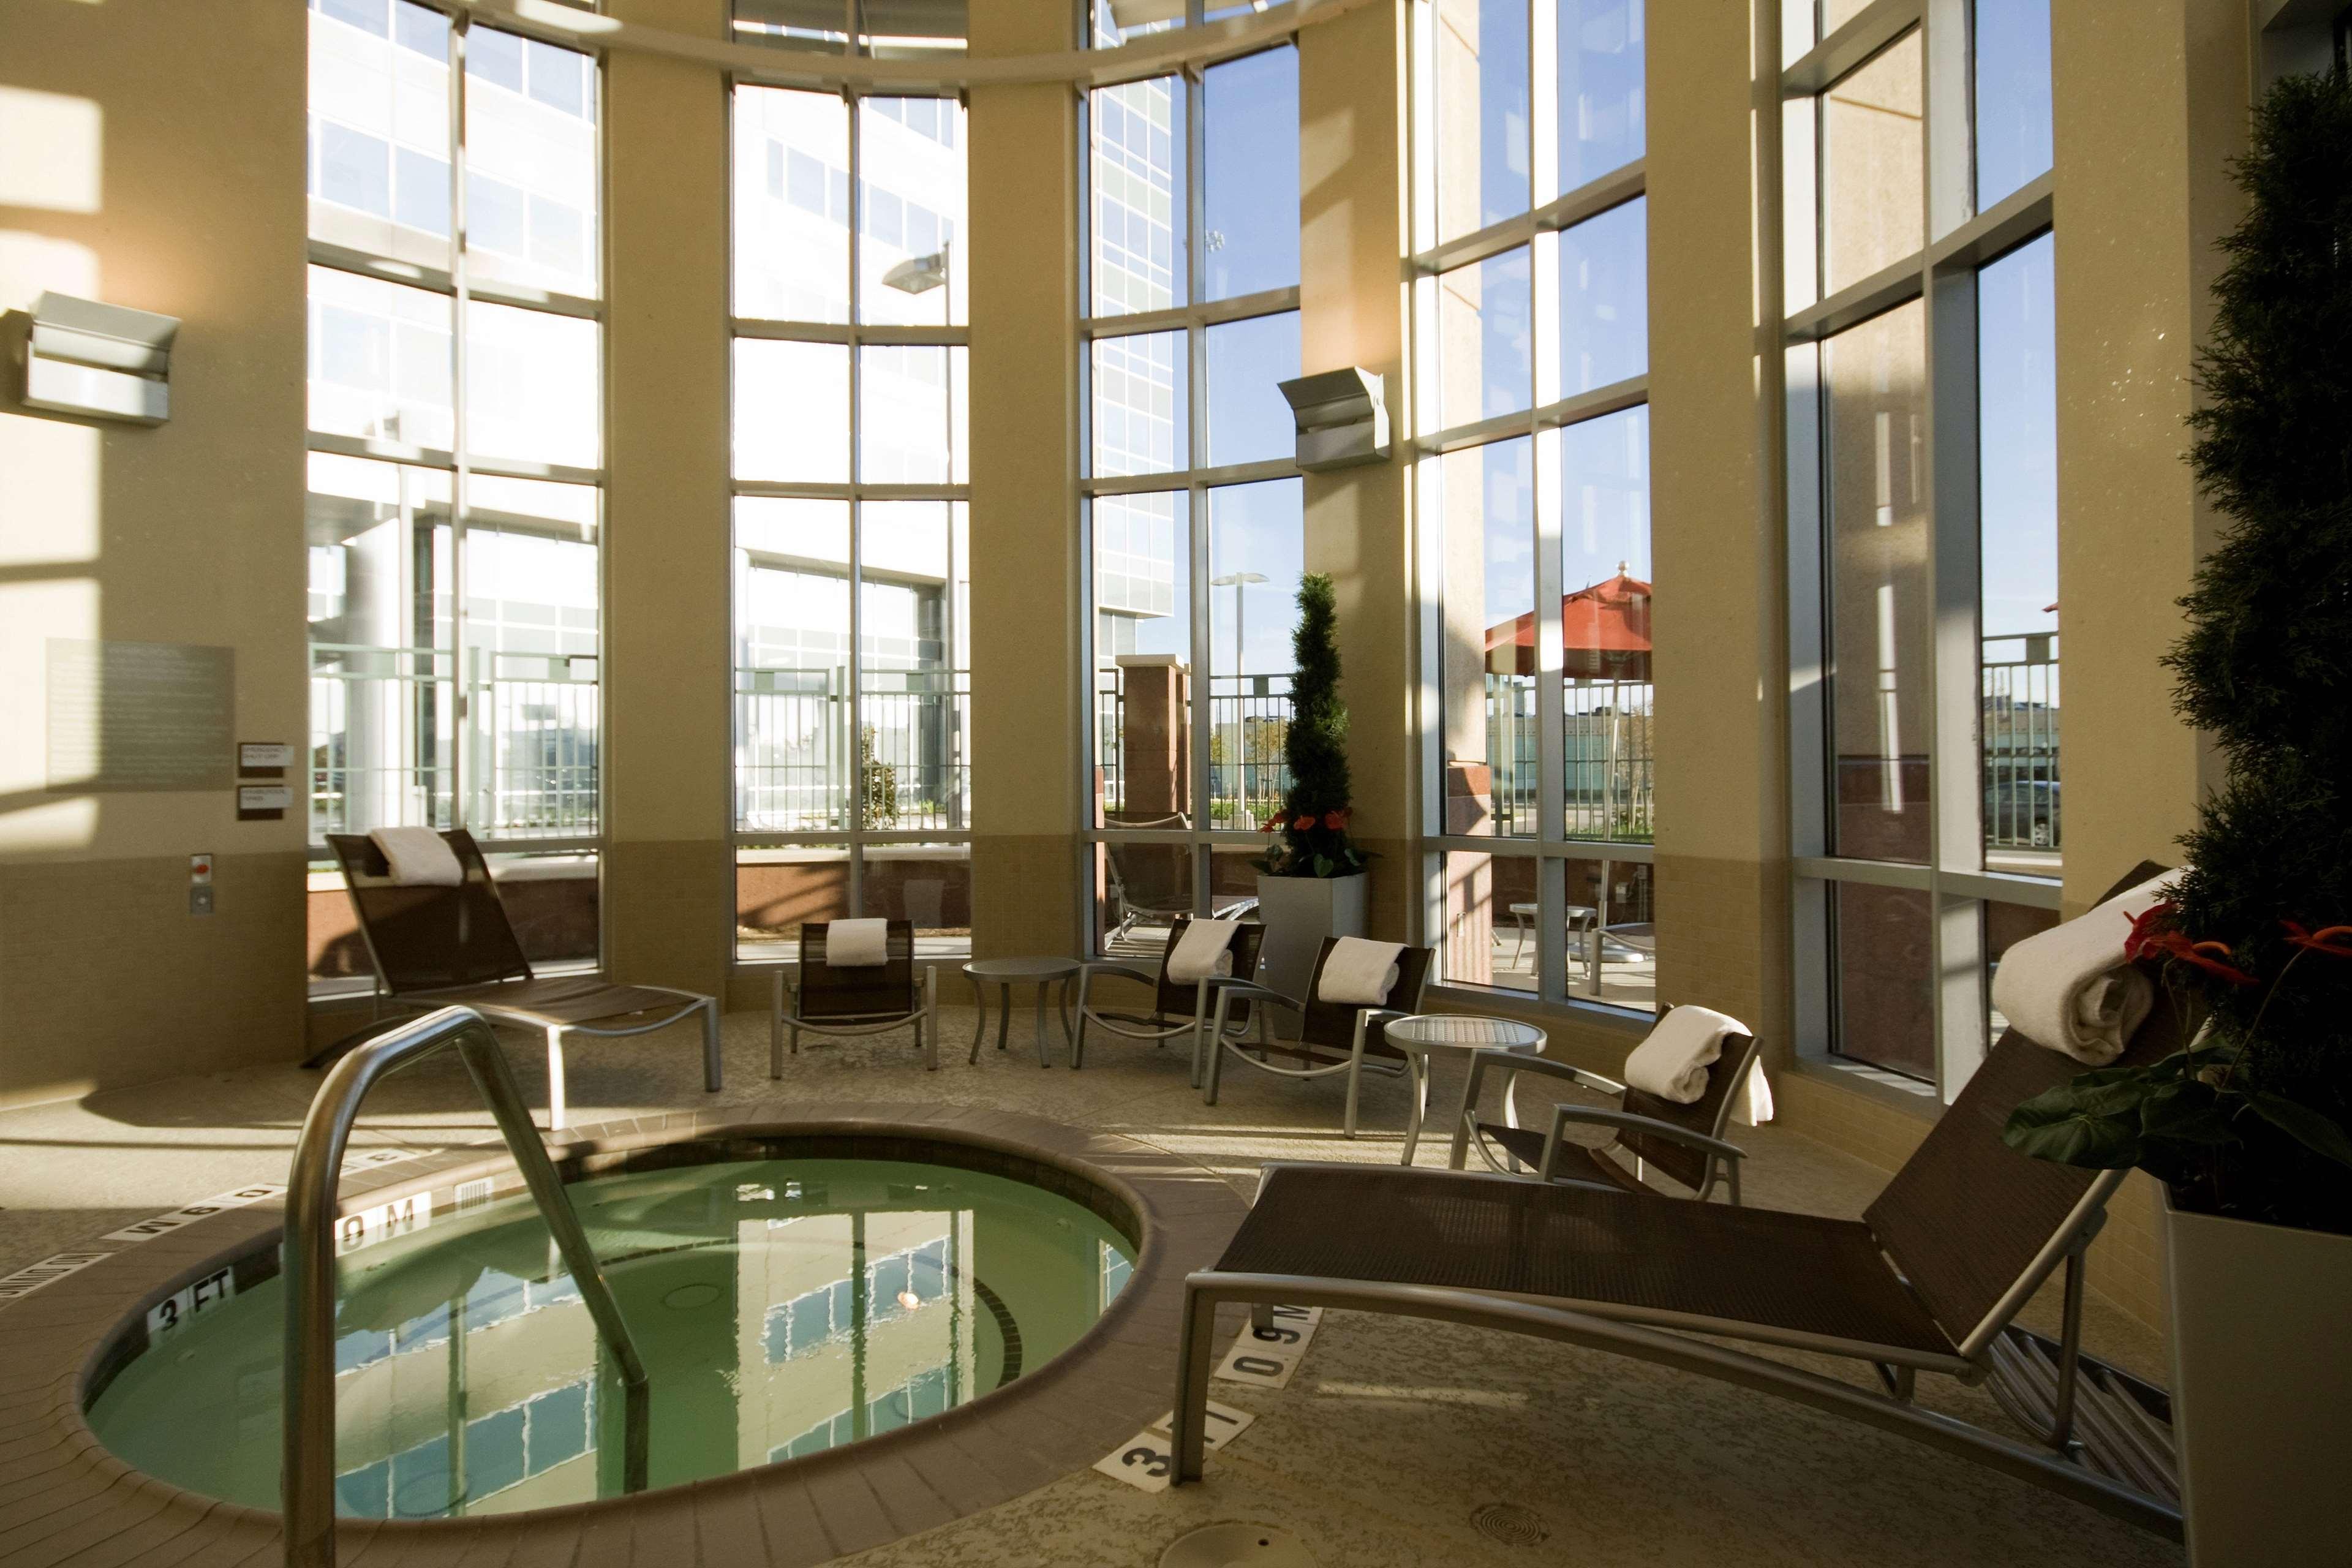 Embassy Suites by Hilton Houston Energy Corridor image 11